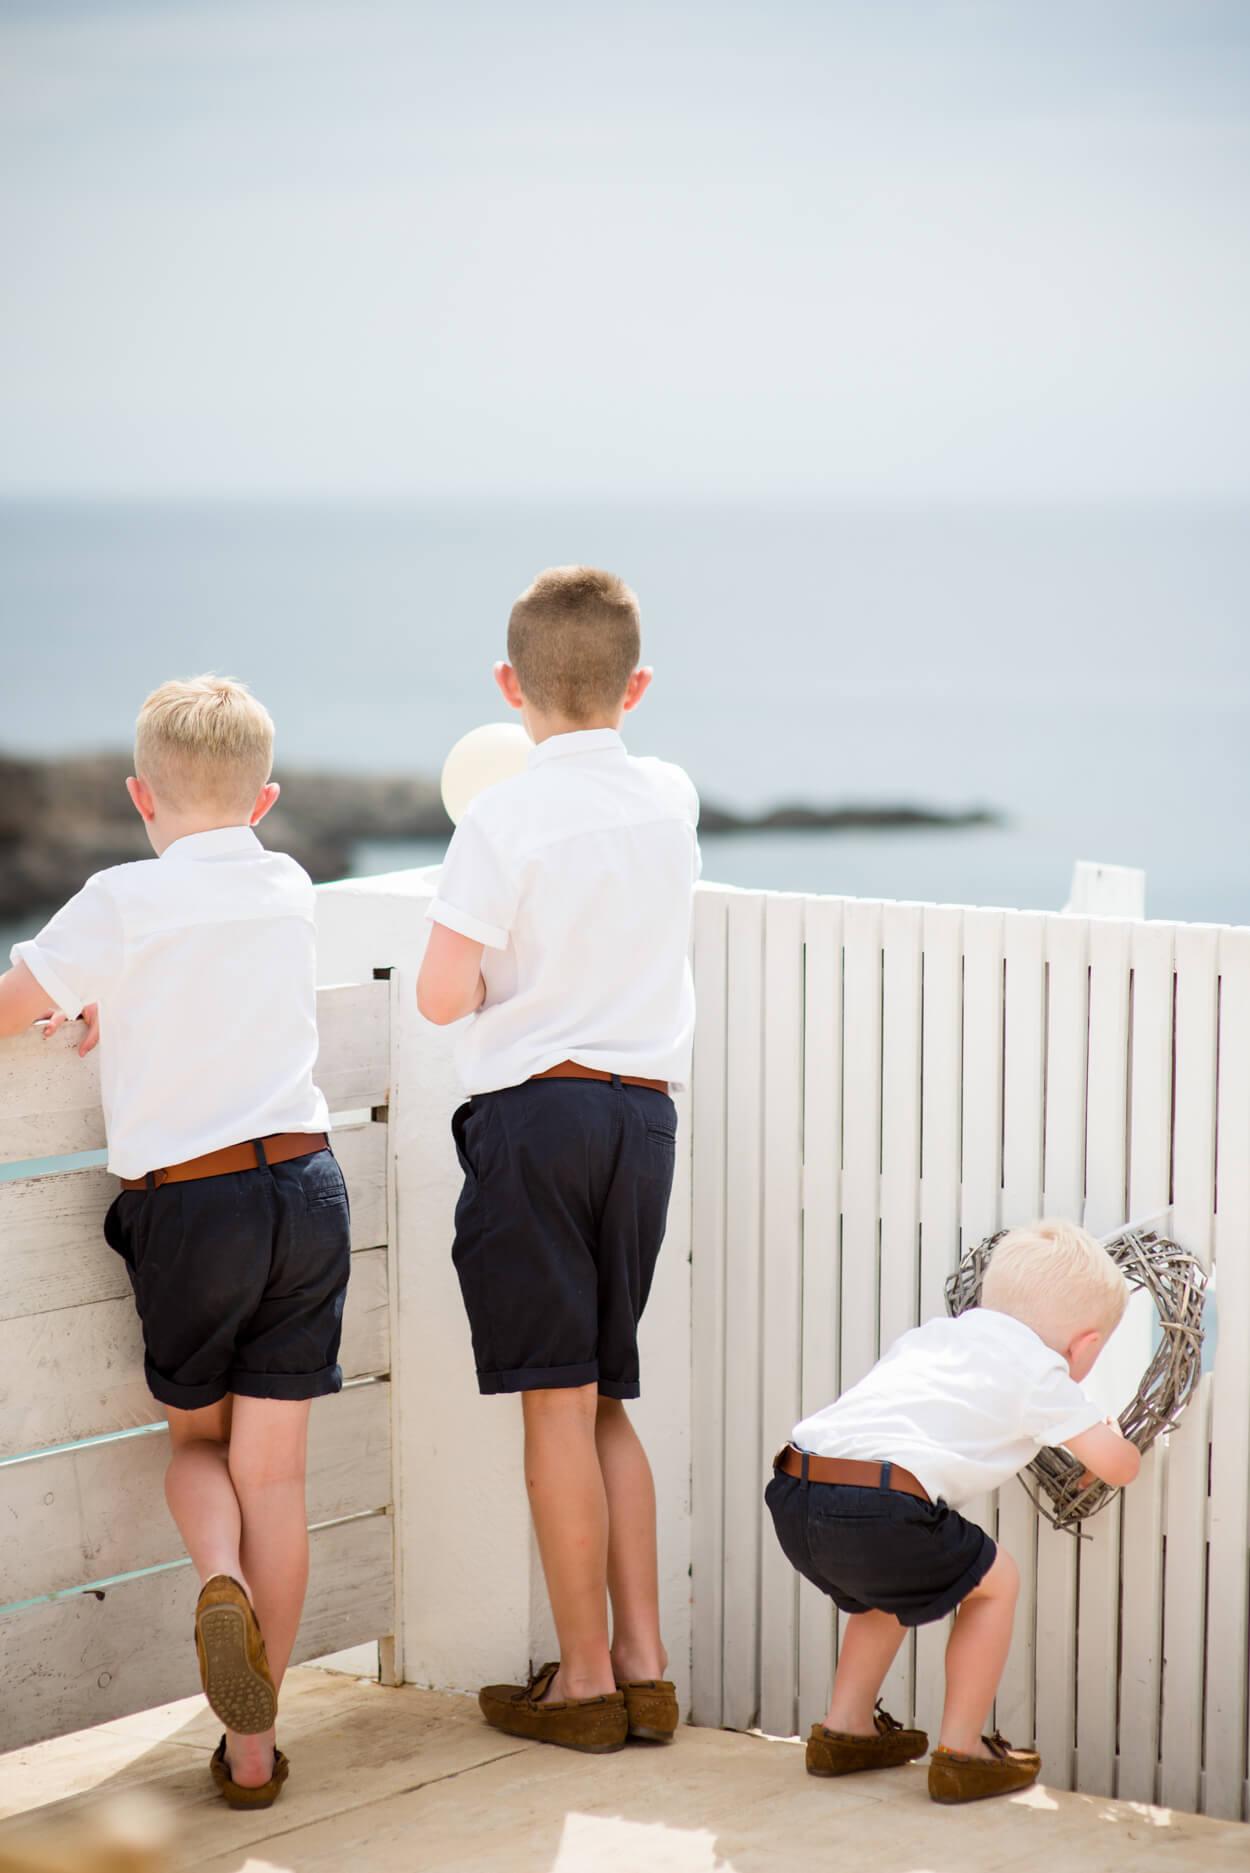 paige boys sea view watching horizon children